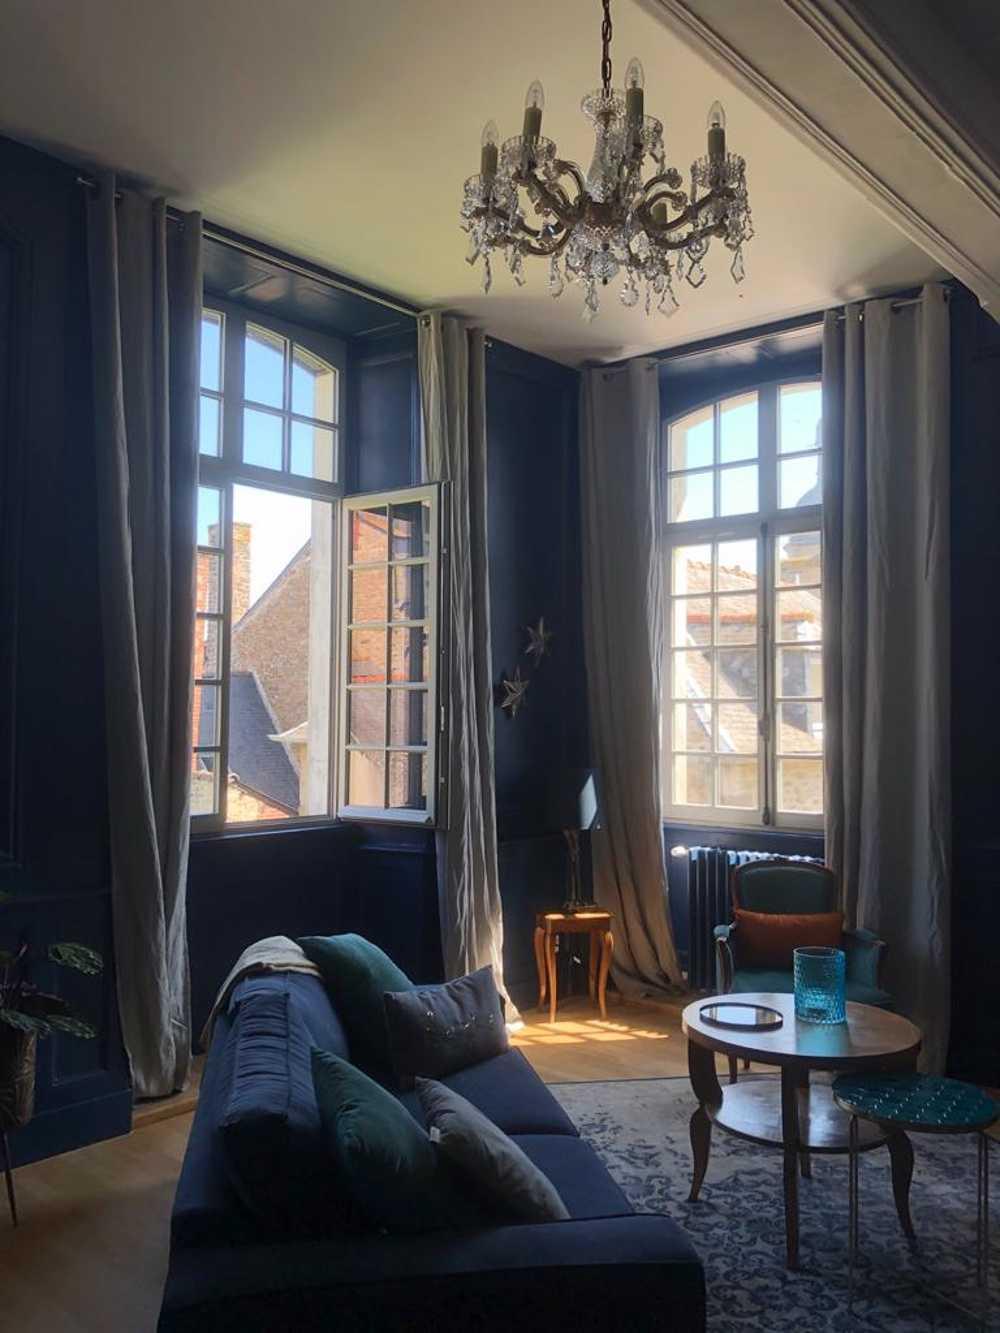 Installation de fenêtres en bois - Dinan (22) 0